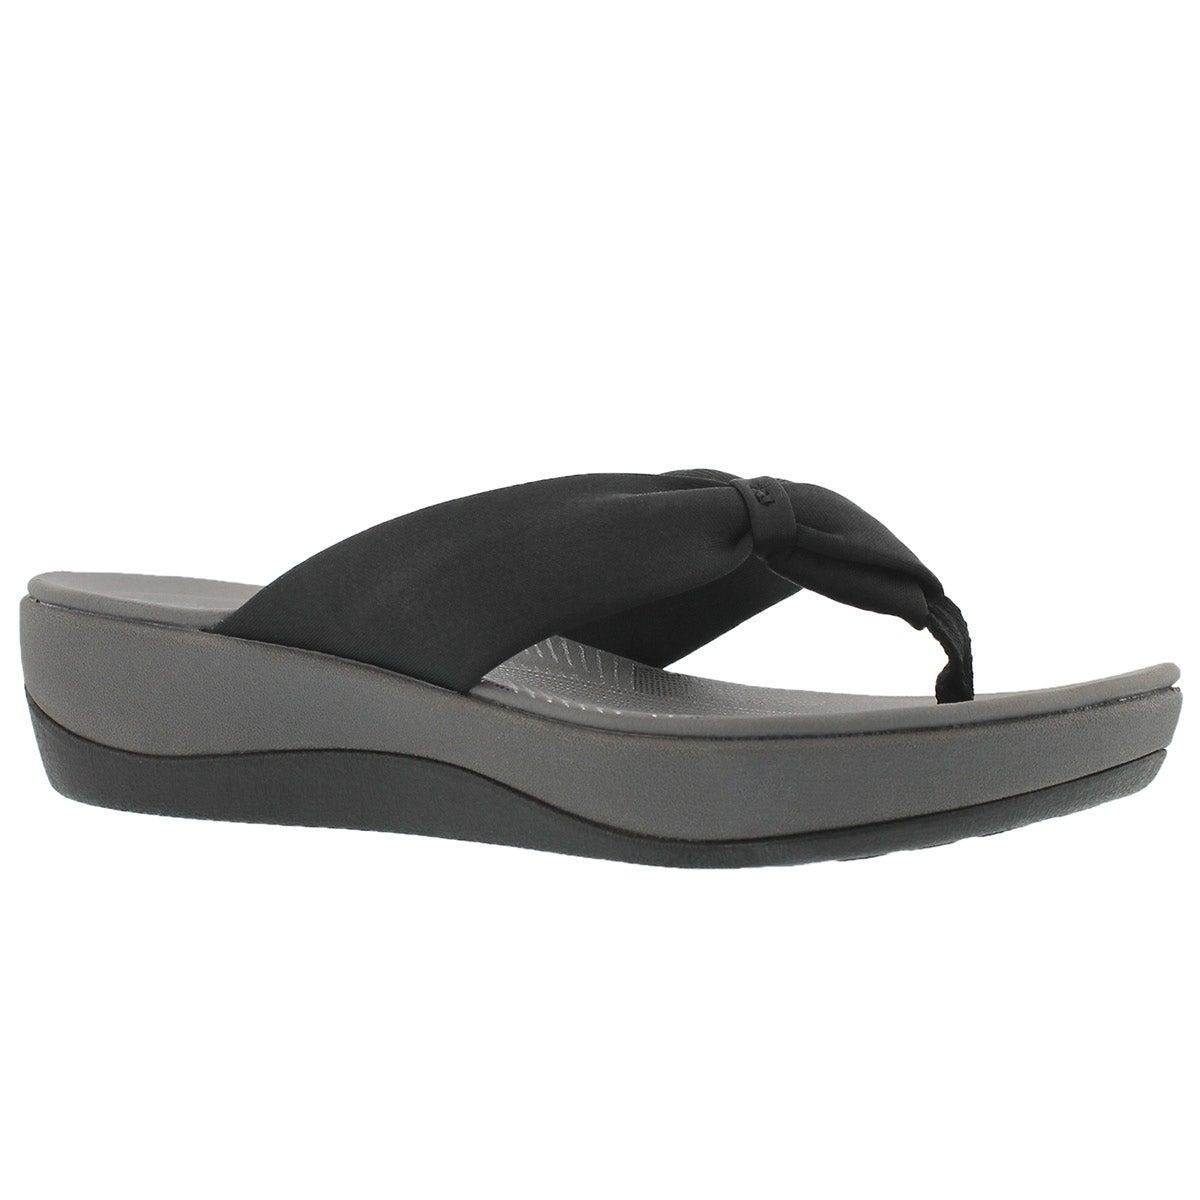 Women's ARLA GLISON black thong wedge sandals